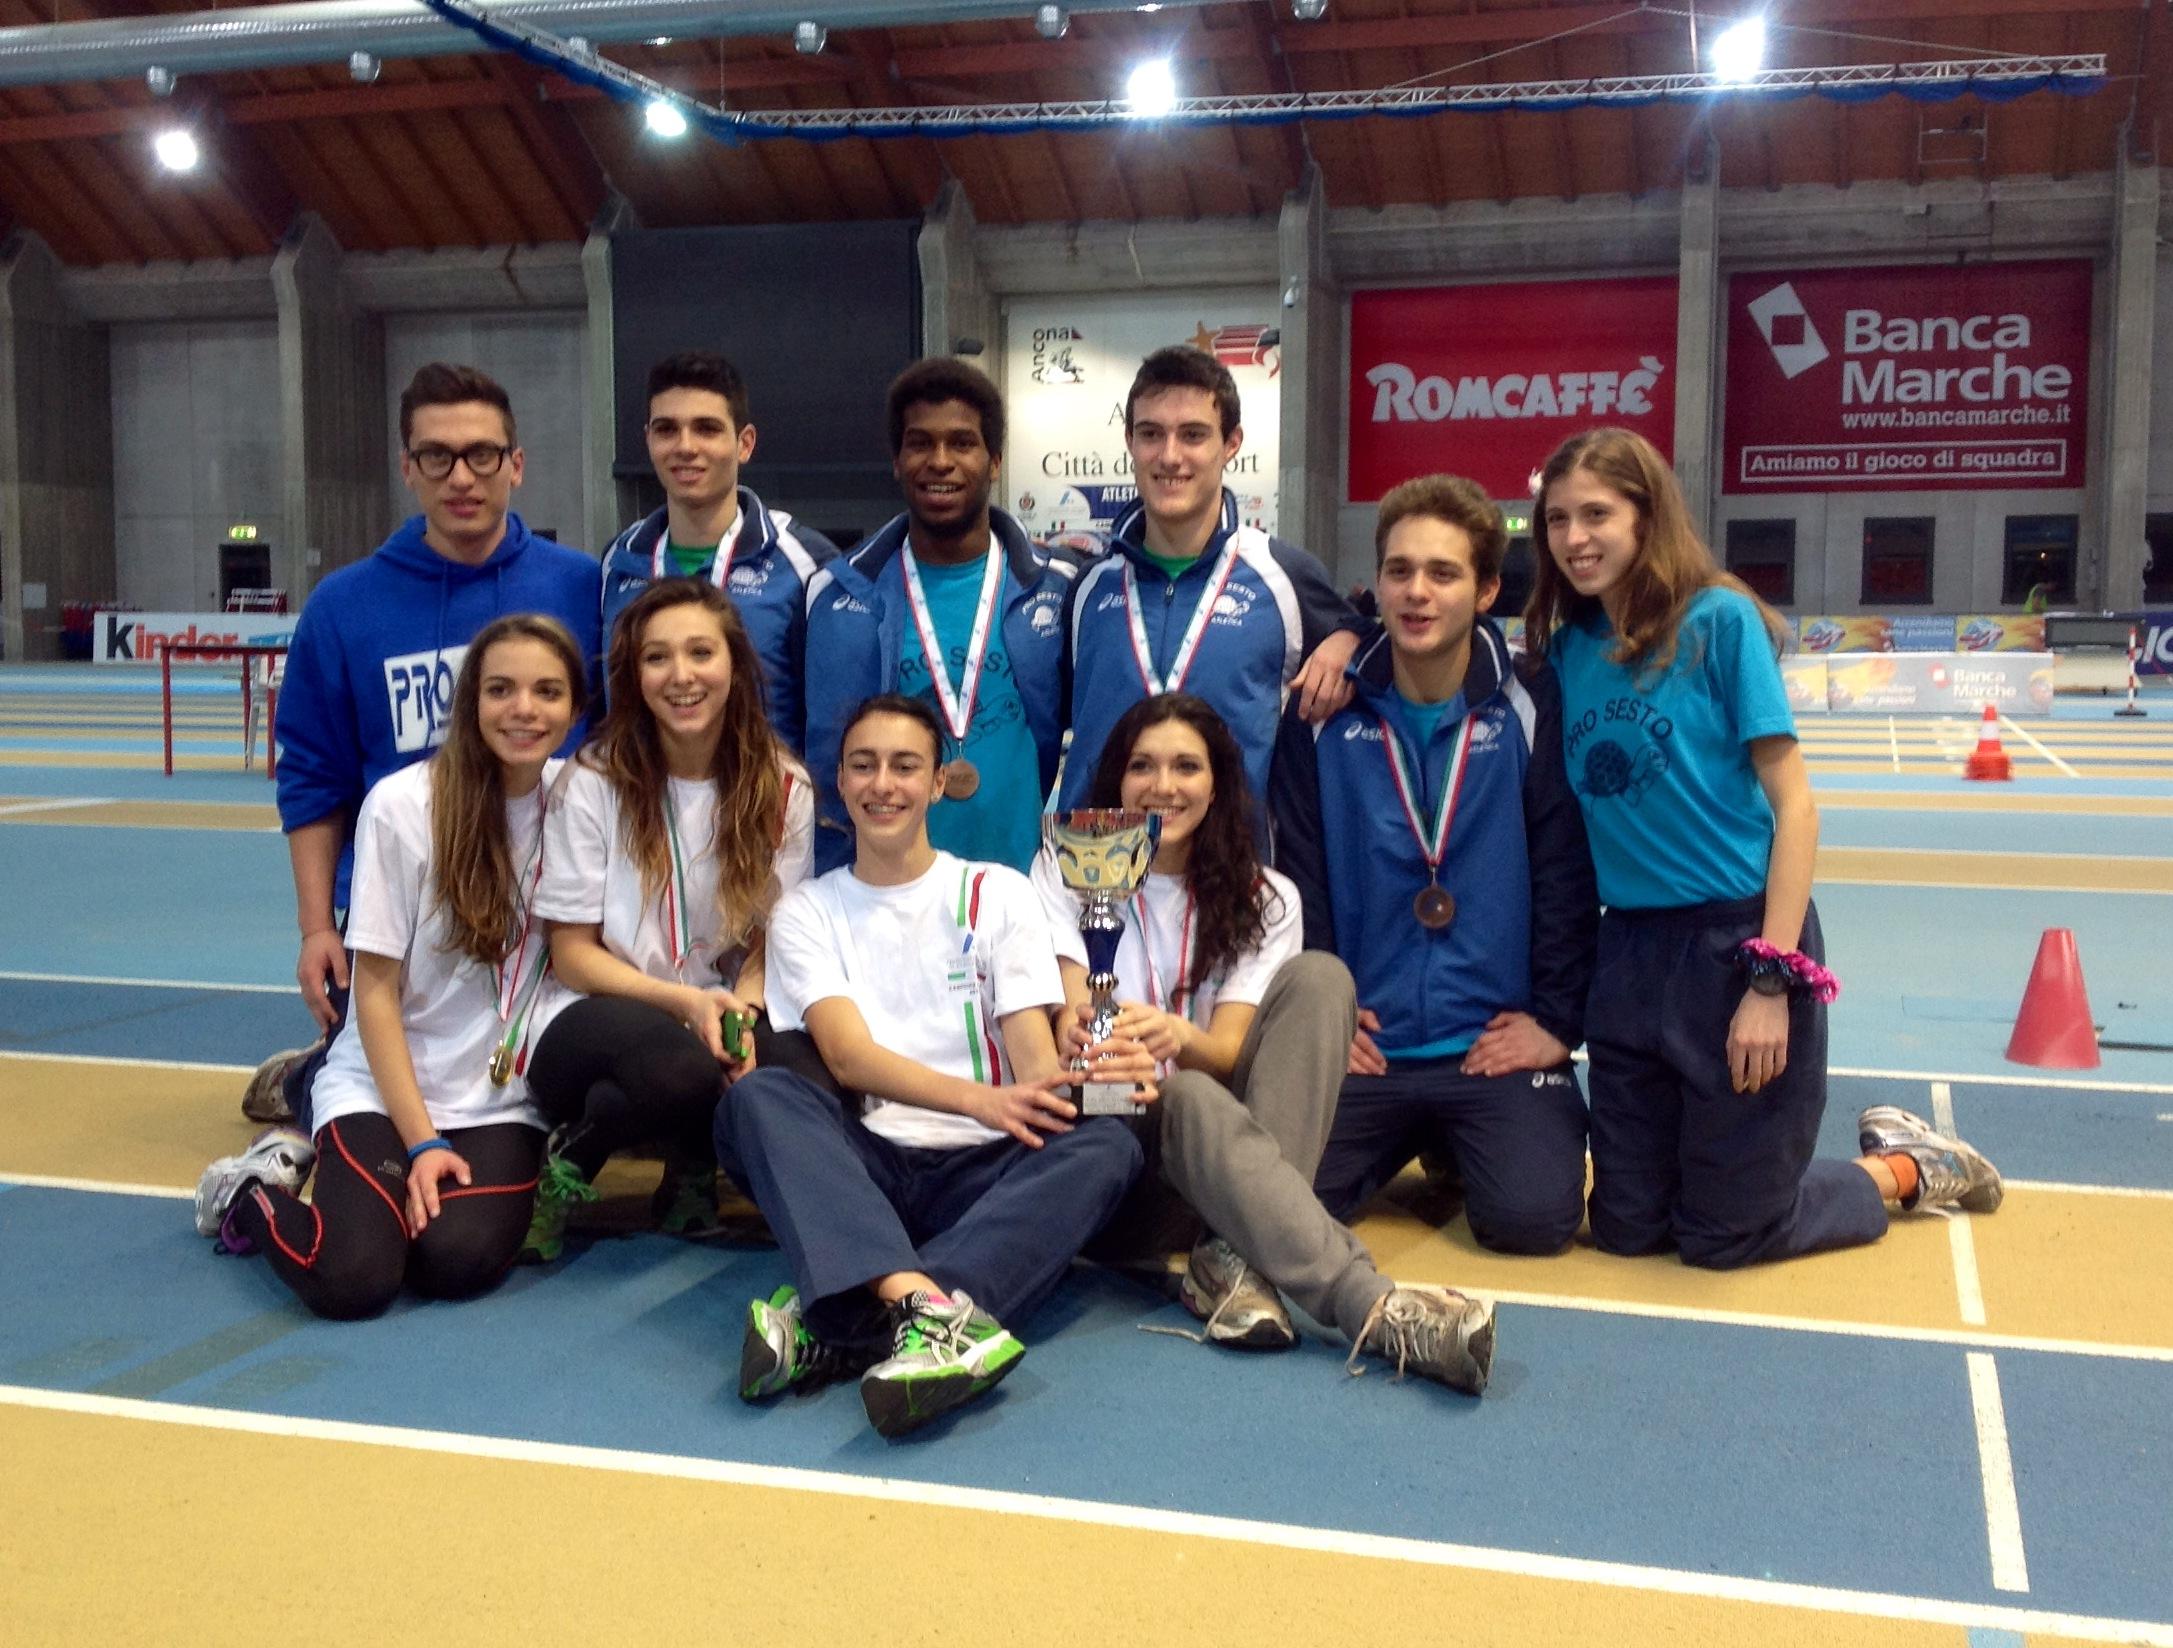 Campionati Italiani di categoria